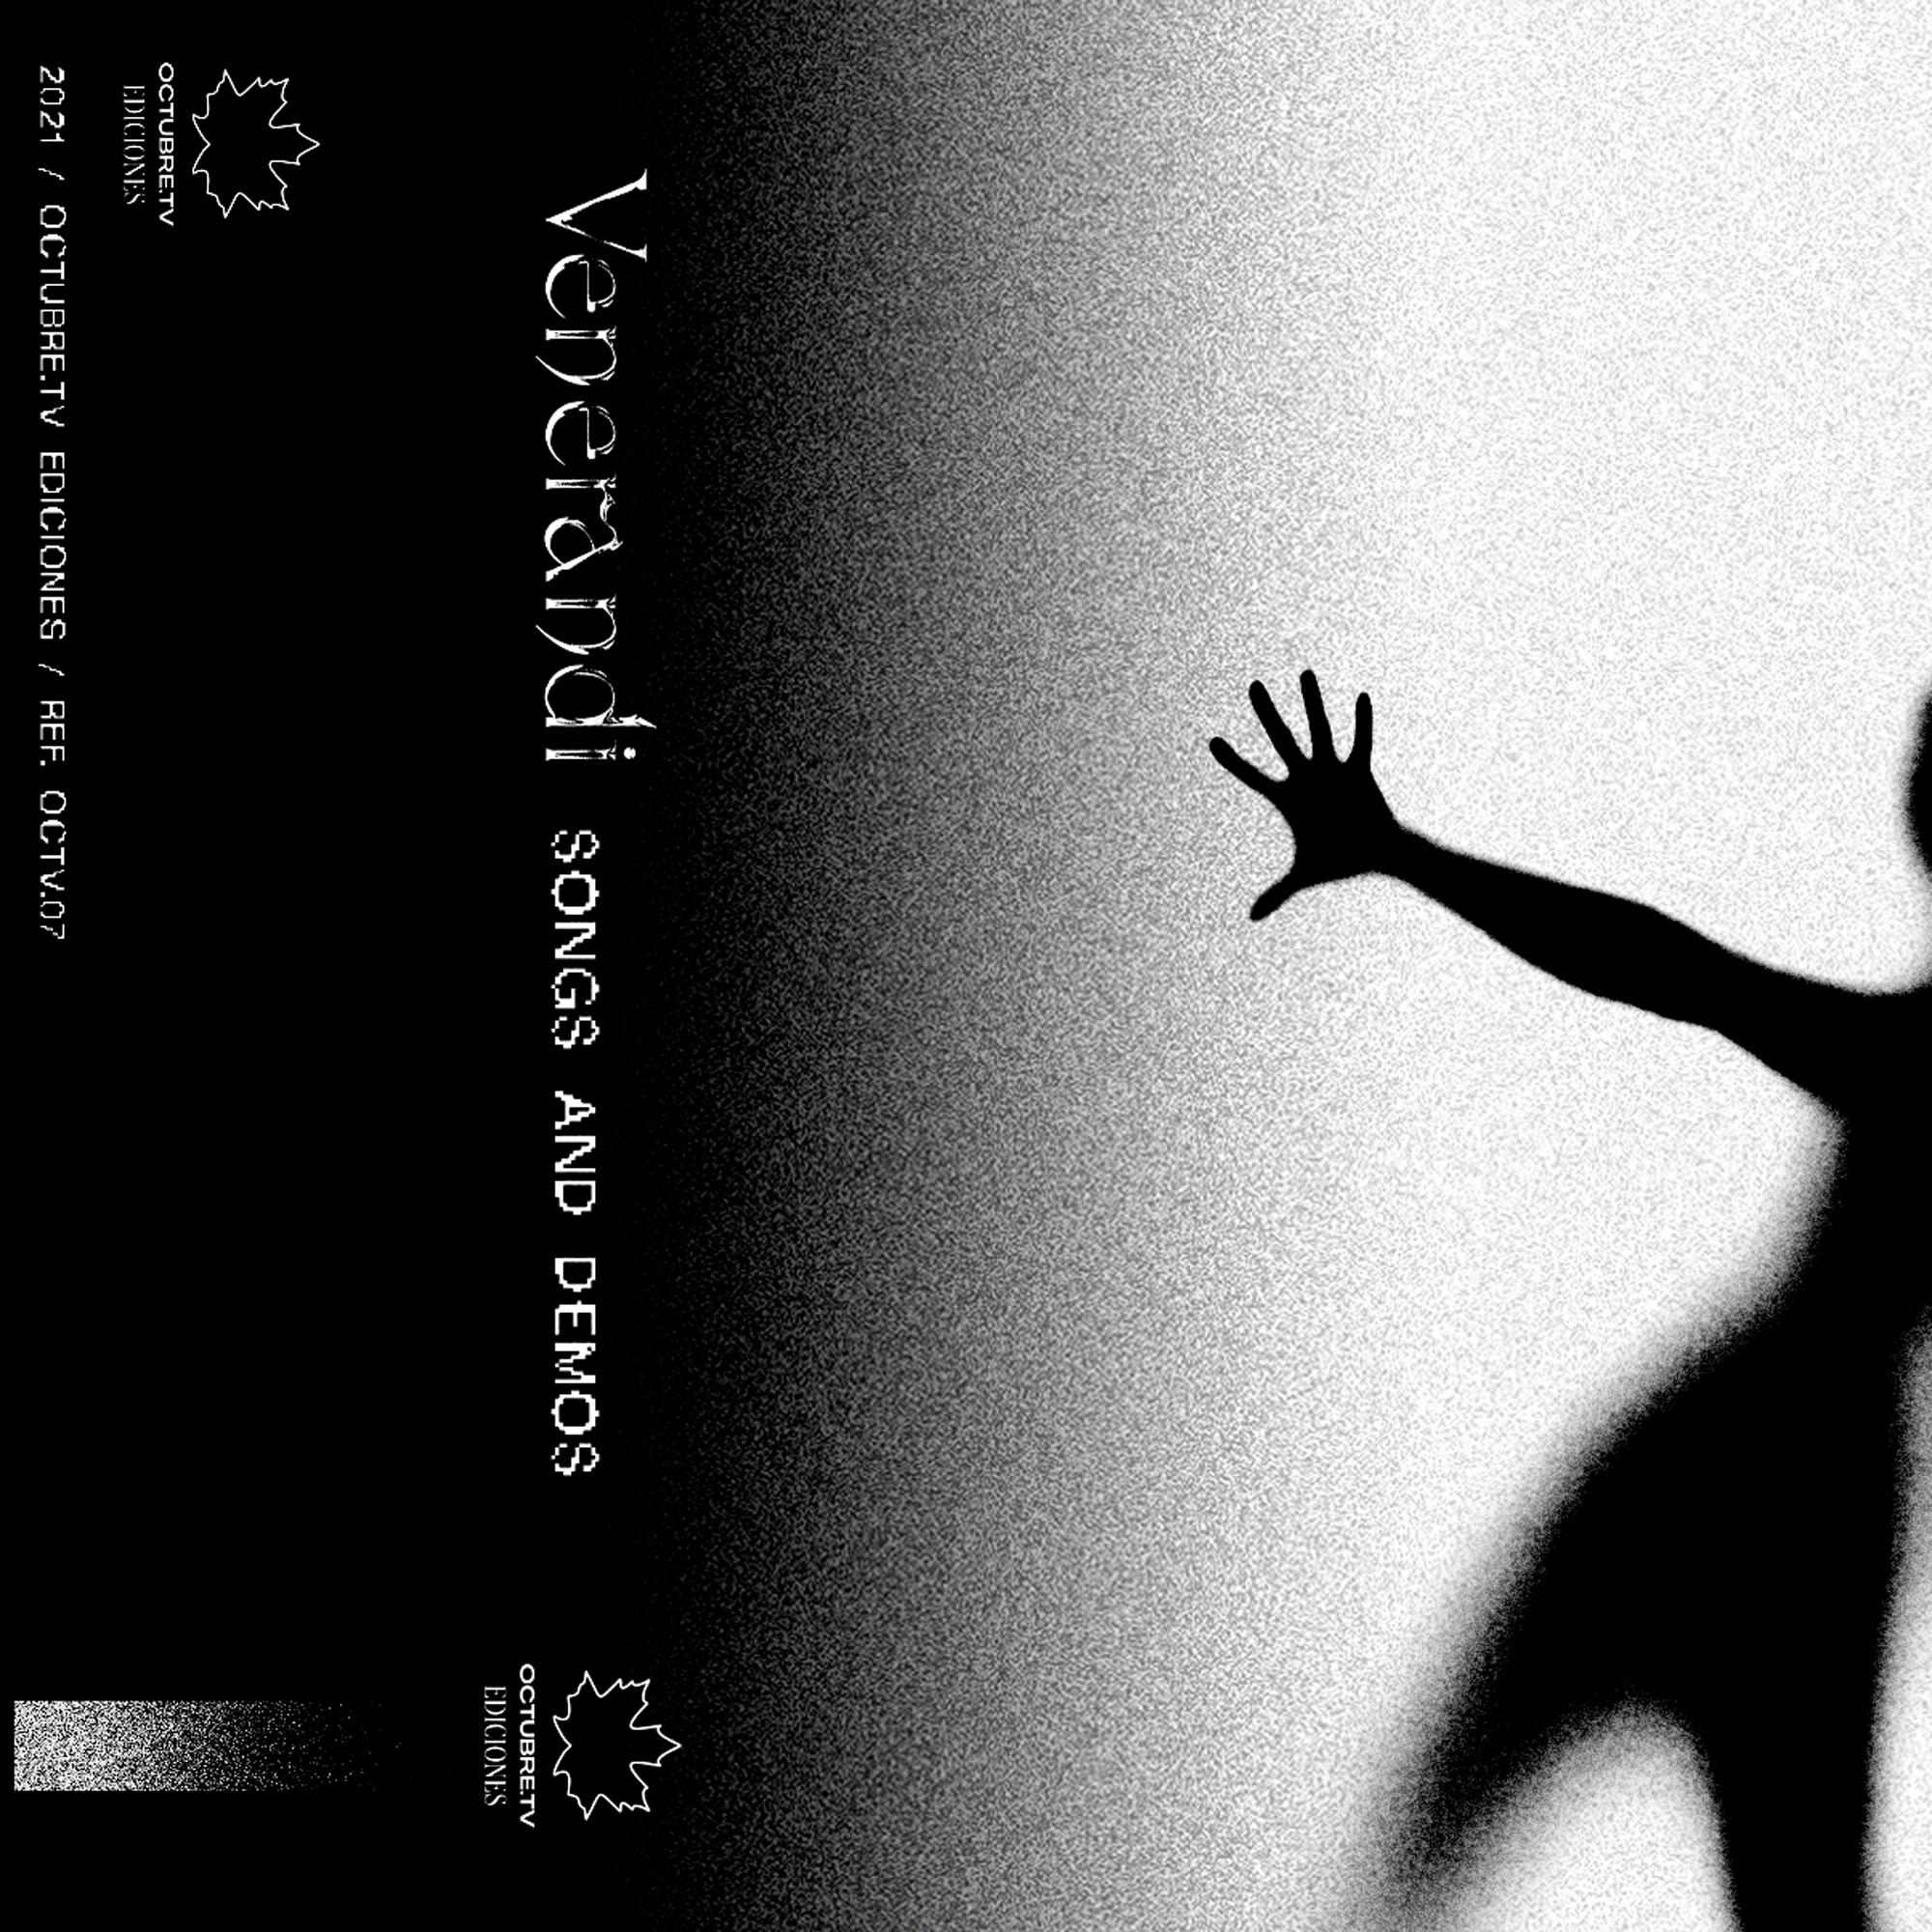 Venerandi - Songs and demos